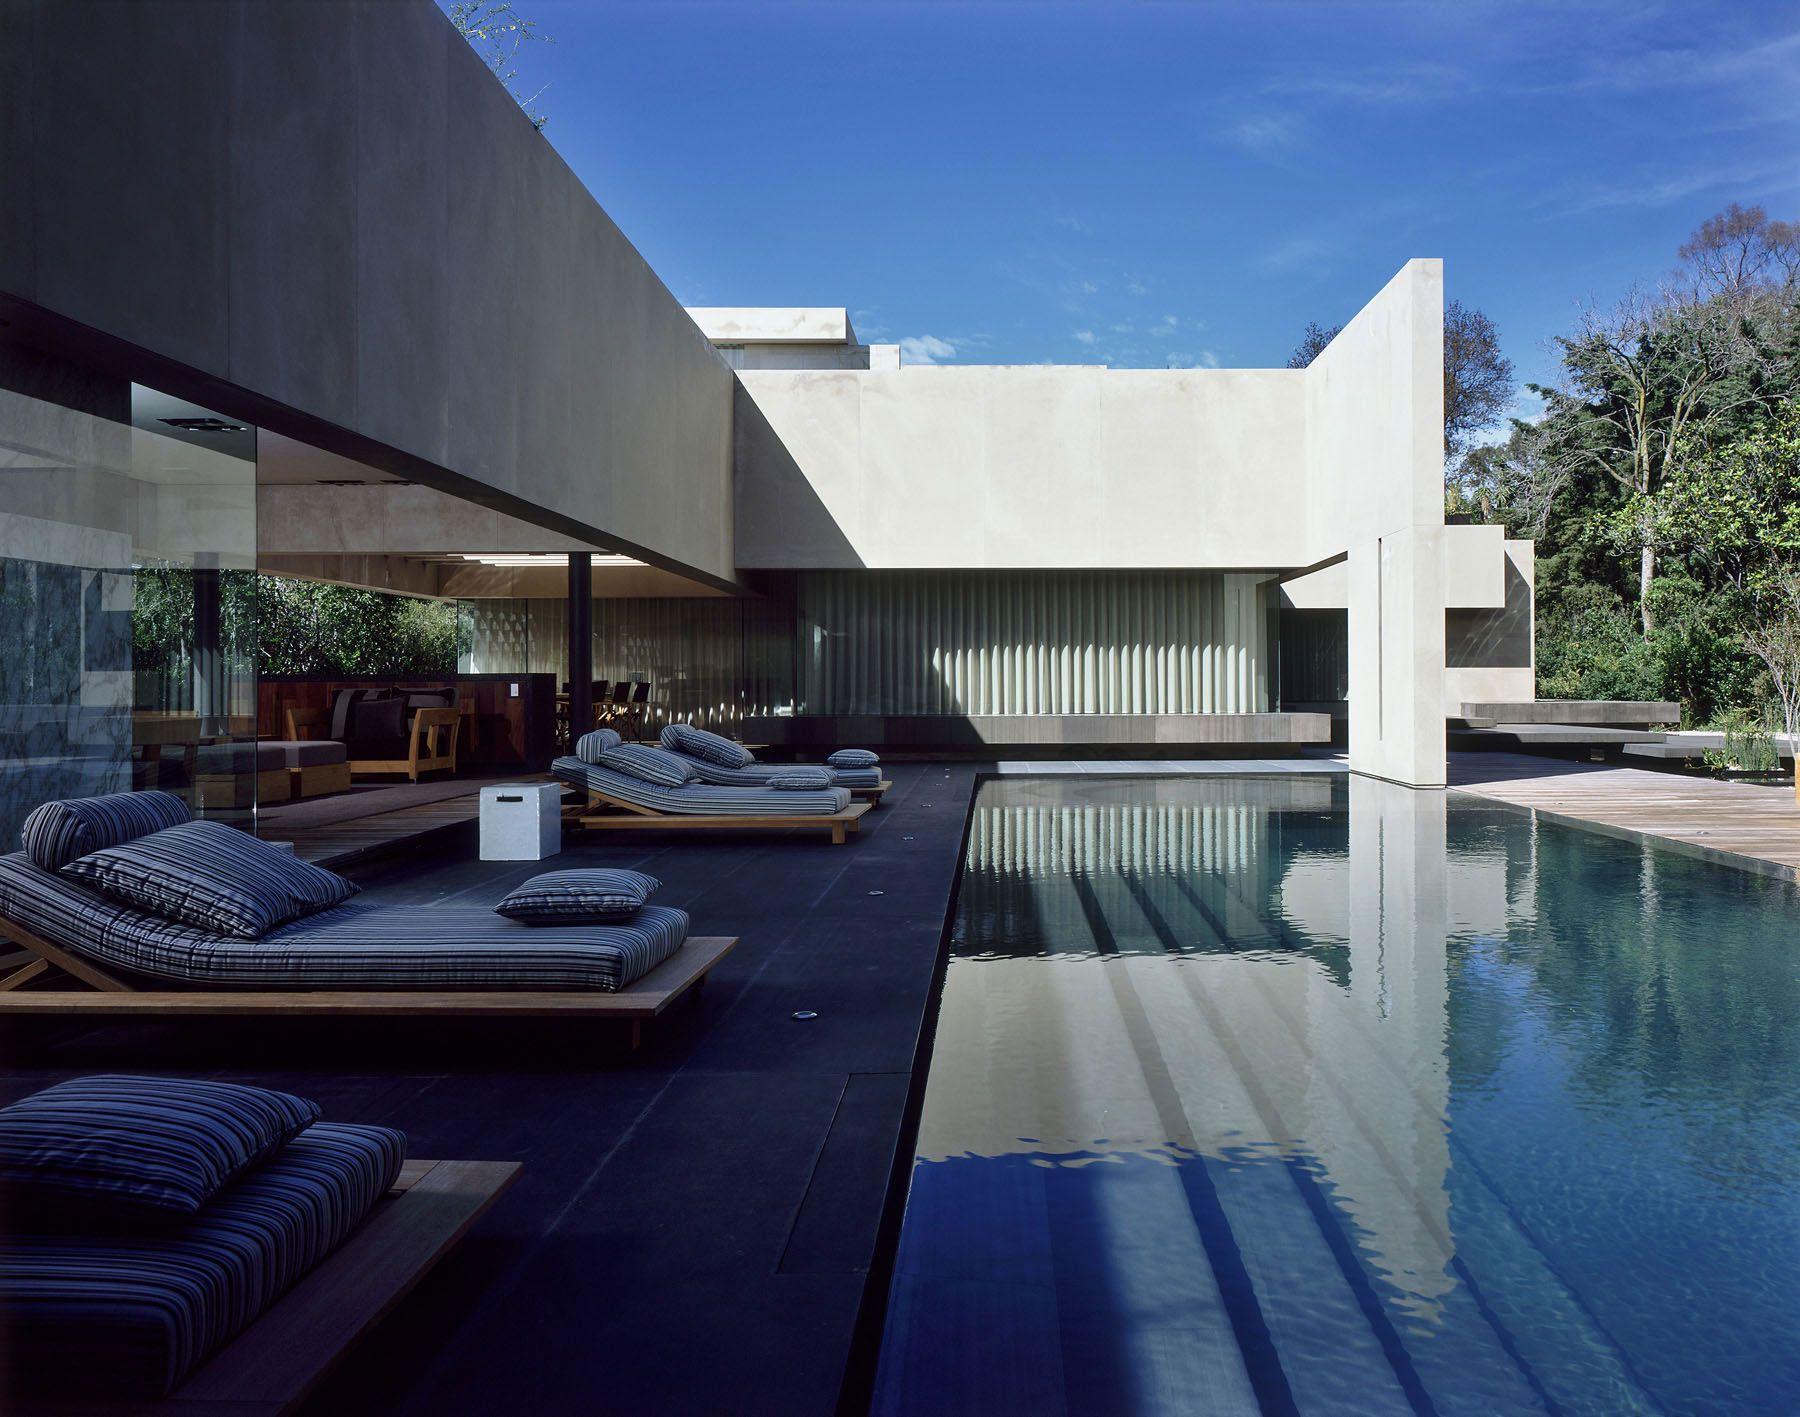 Central de arquitectura a mexico city based design studio has - Casa Reforma 03 Casa Reforma 04